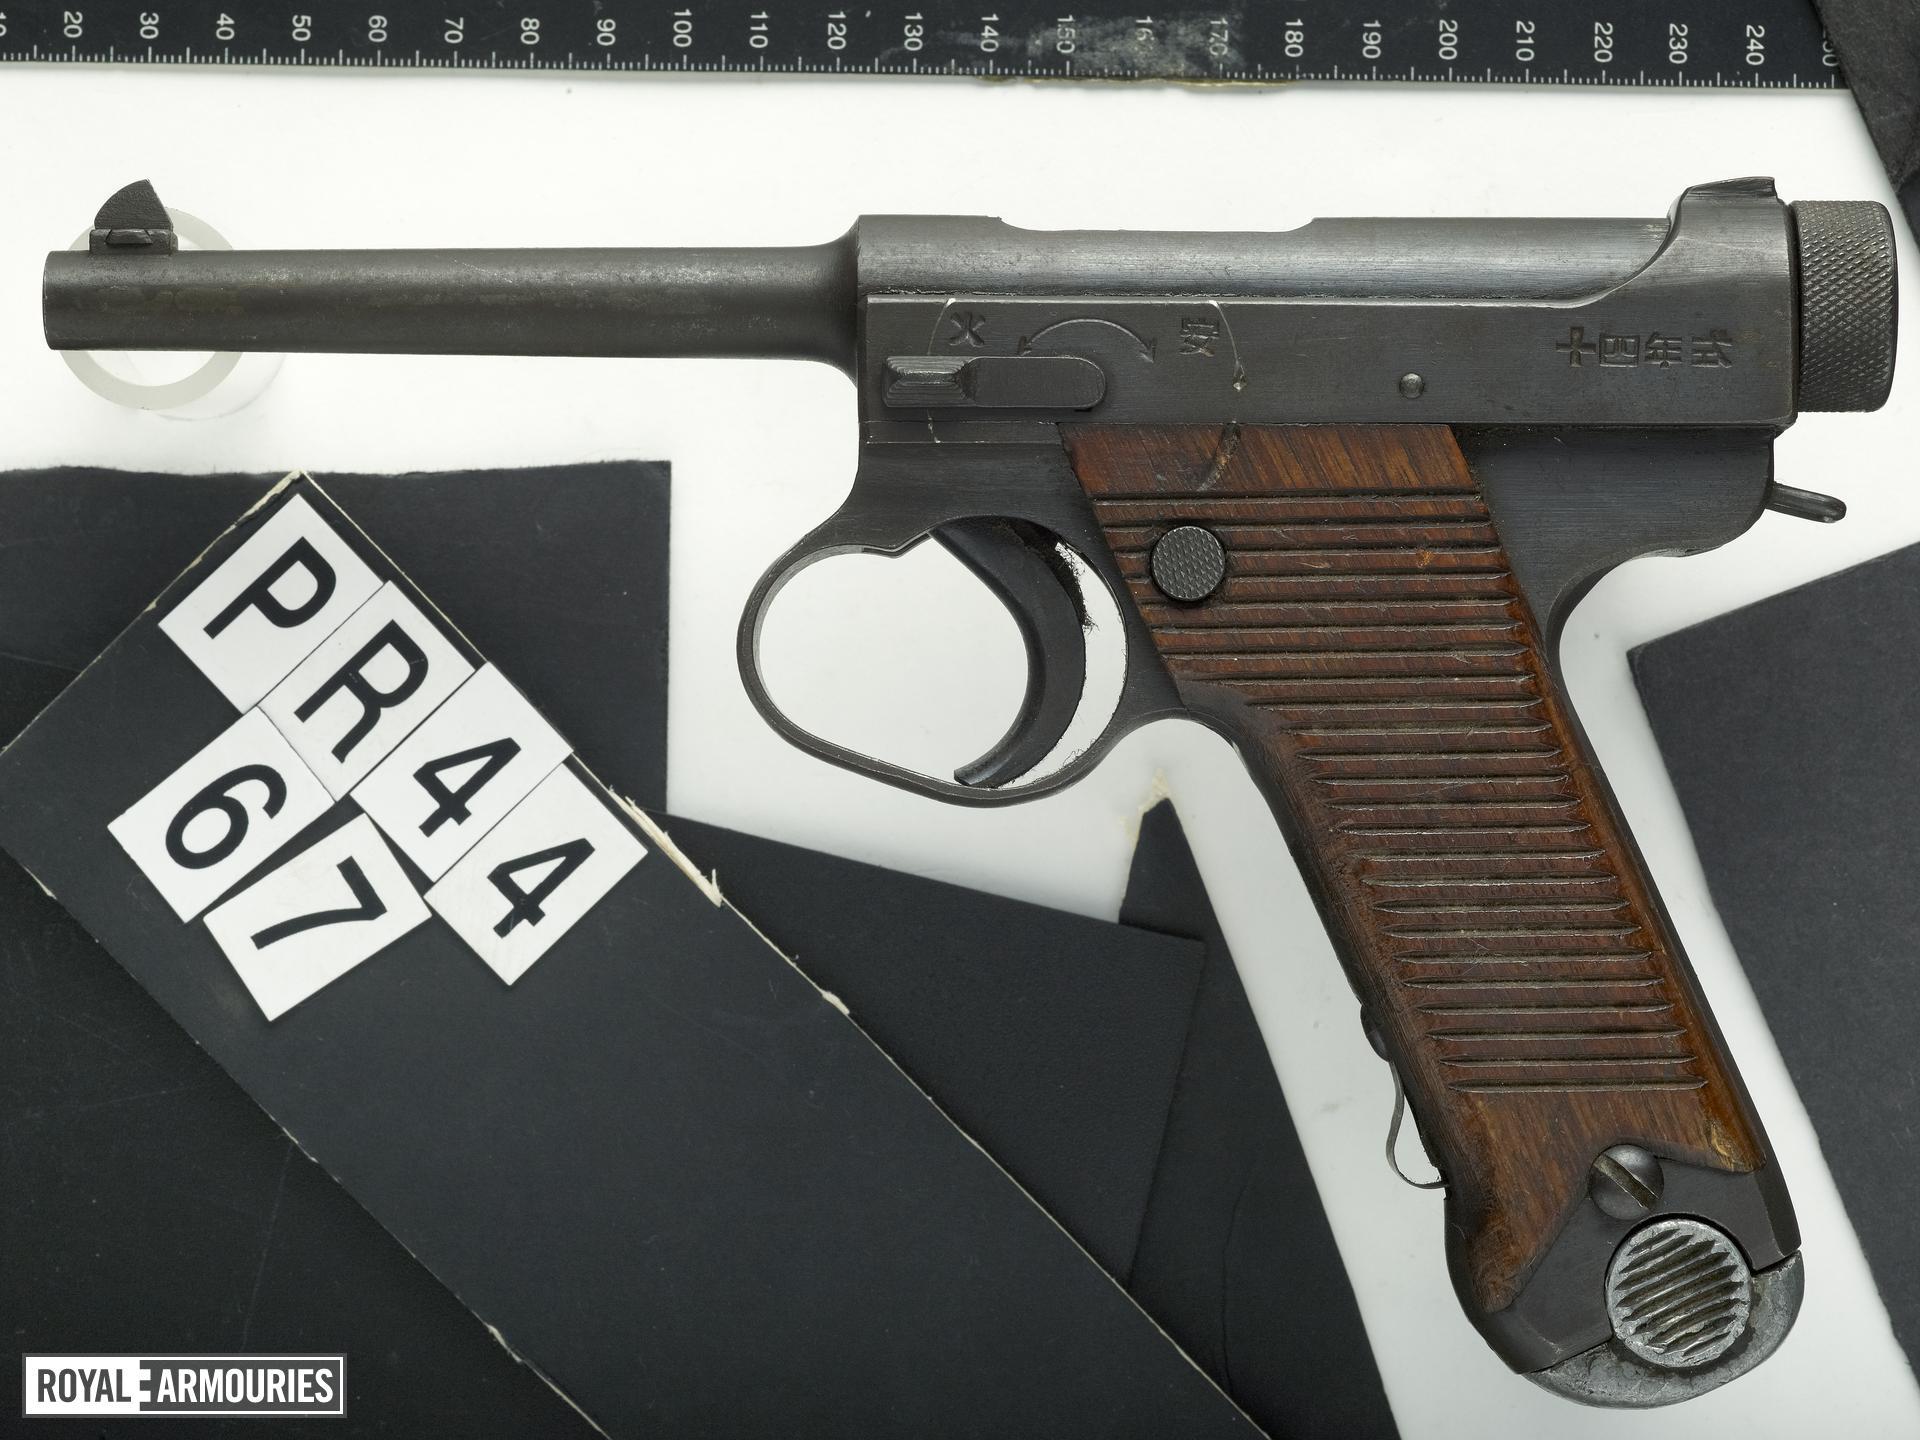 Centrefire self-loading pistol - Nambu Type 14